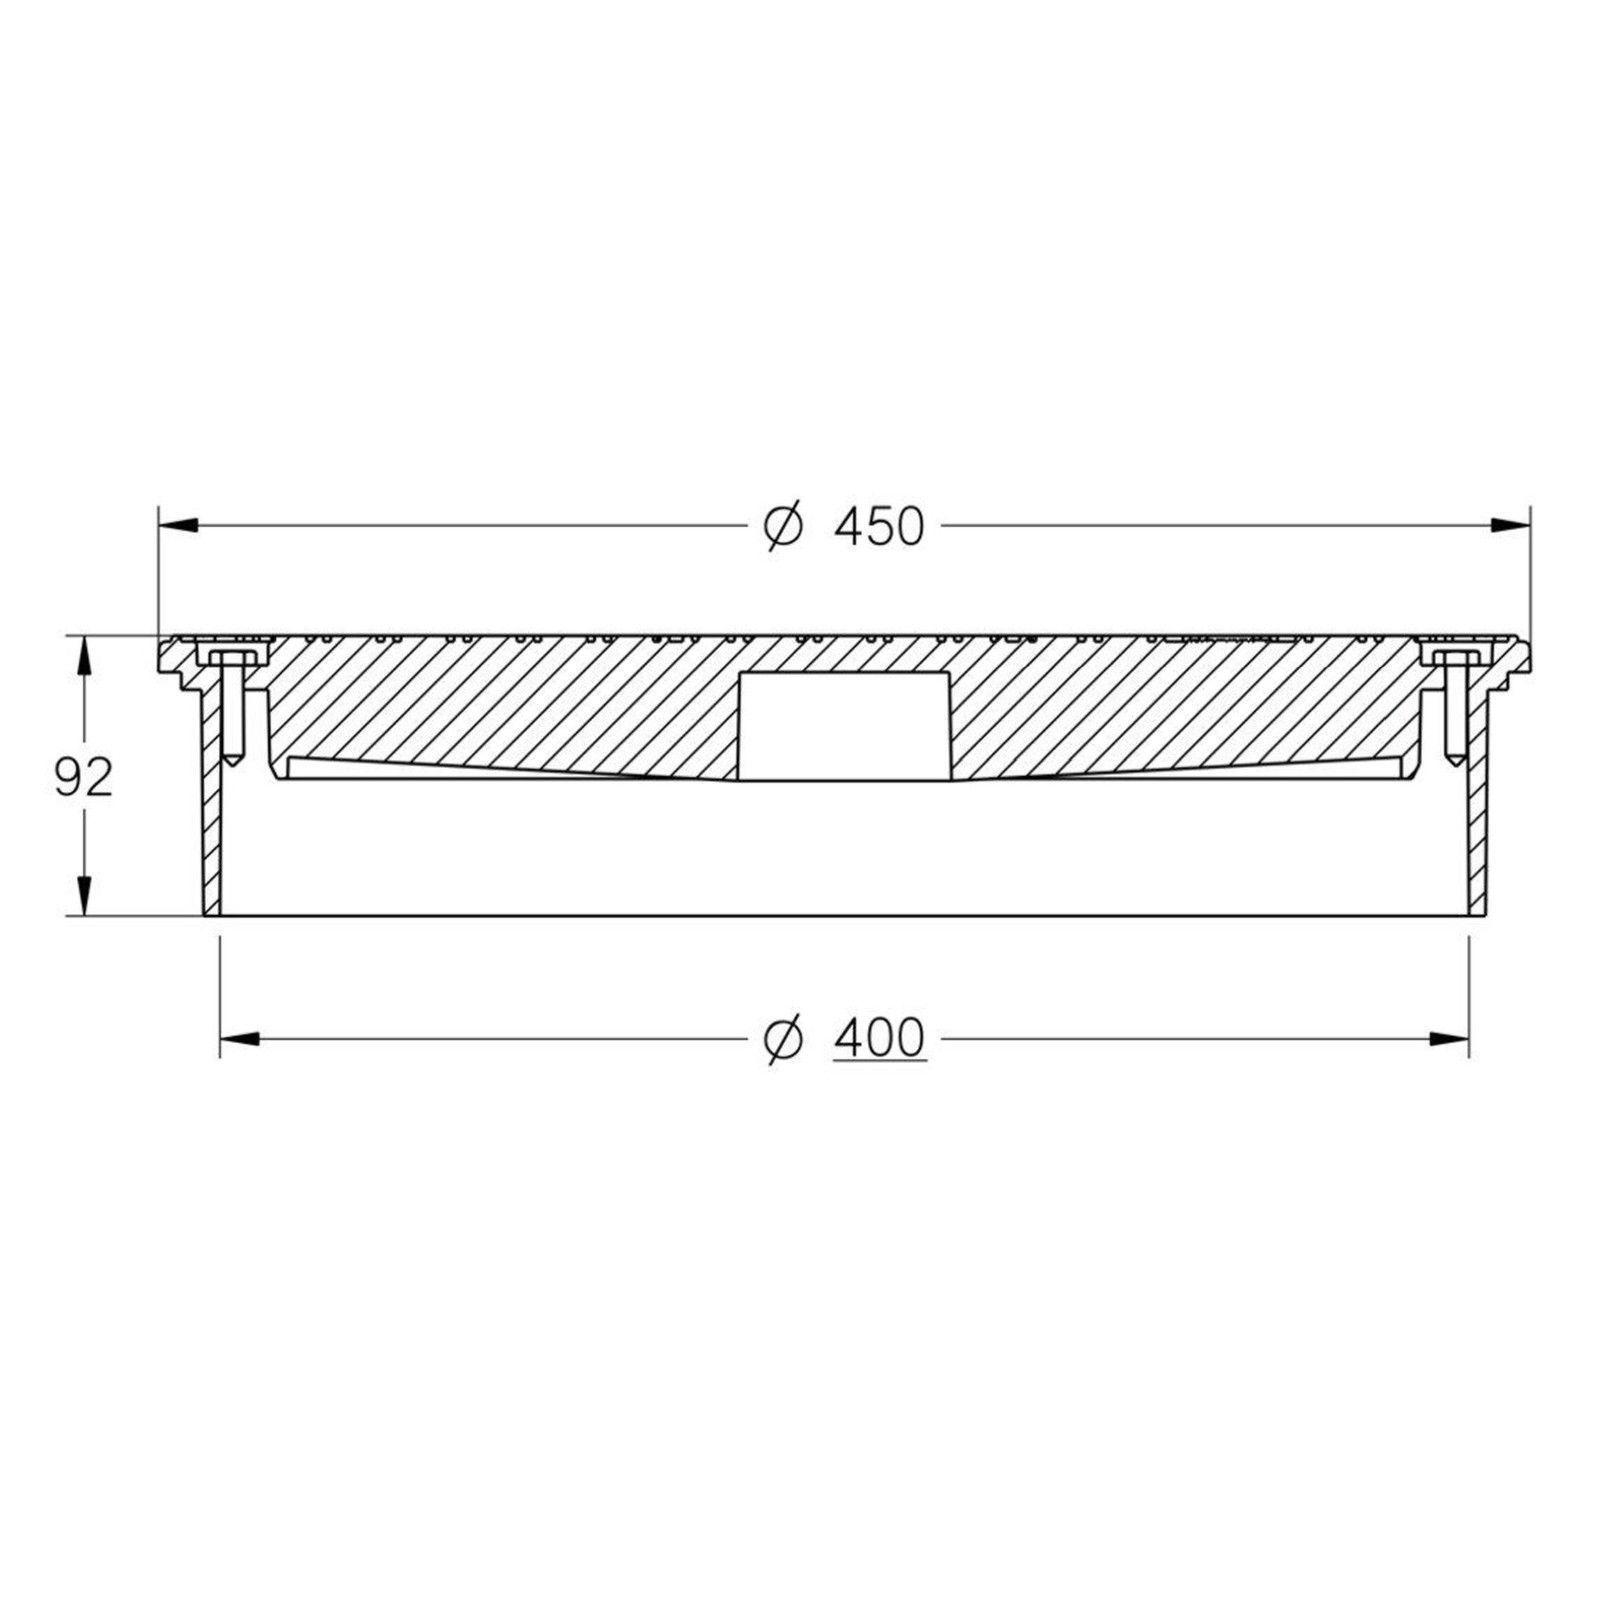 Rohr DN400 KG Schacht Abwasserschacht Schachtboden mit R/ückstauklappe DN400//DN110 DN315 Kanal Entw/ässerung Komplett SET quadratisch Regen Deckel DN315